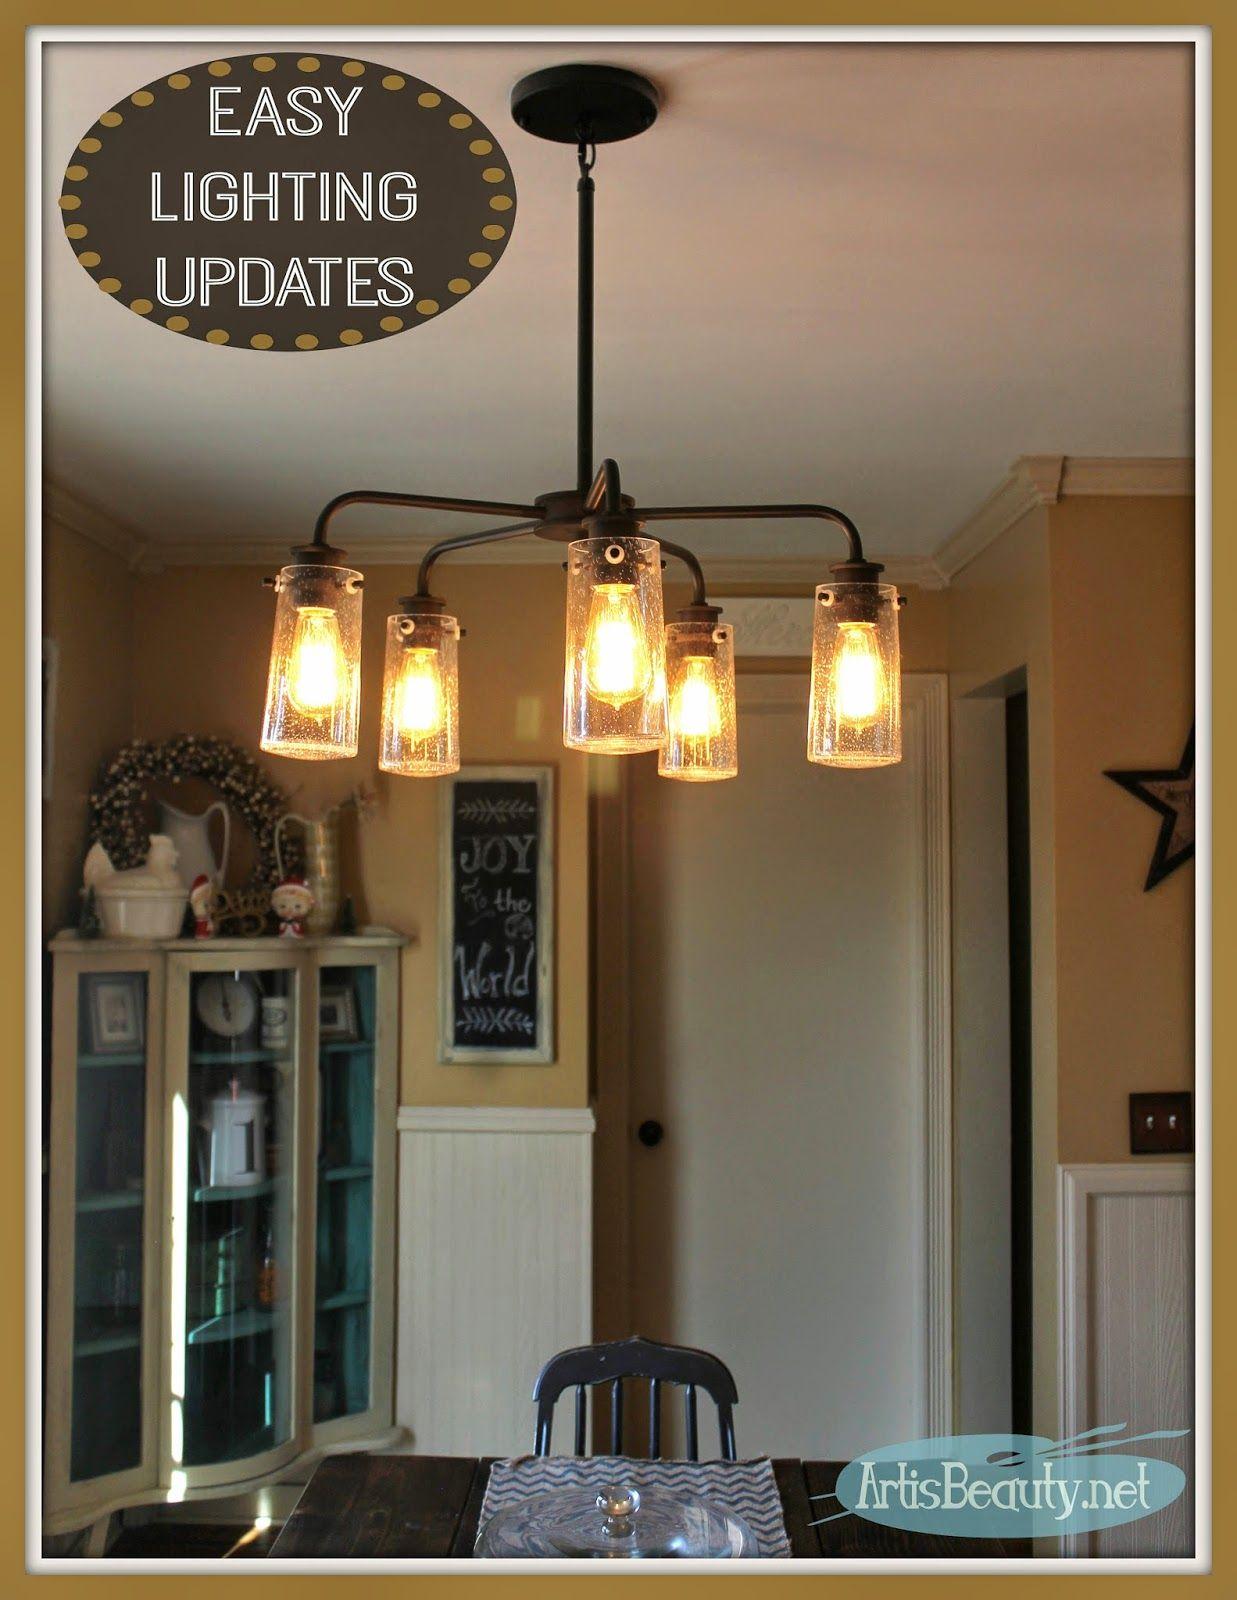 Vintage Style Kitchen Lighting Update! Buh Bye Boob Light